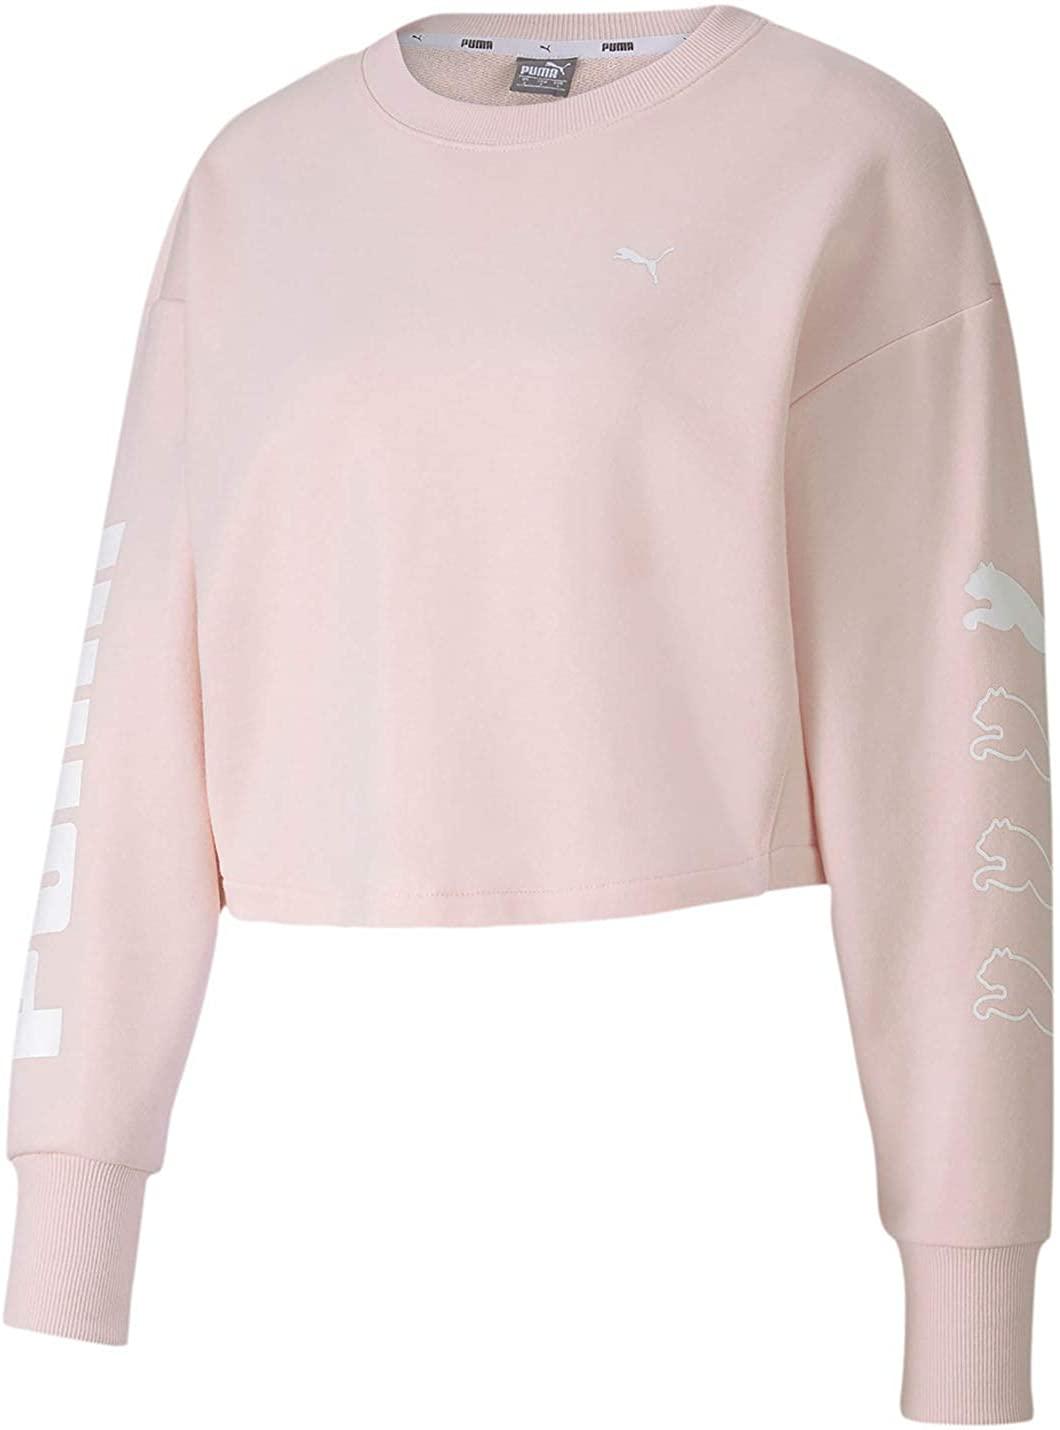 PUMA Womens Sweatshirt